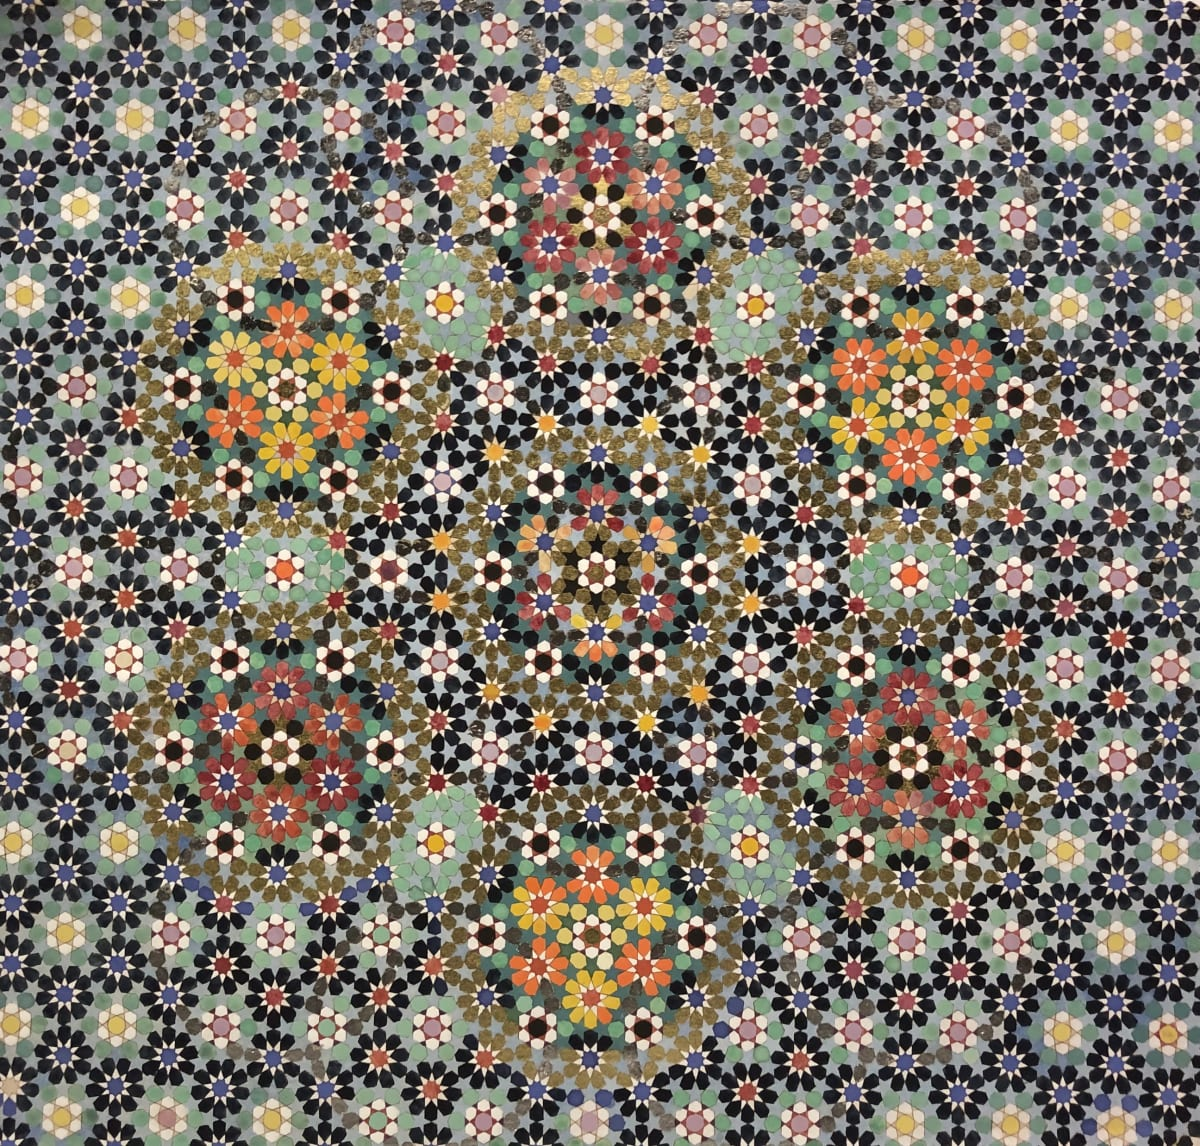 Elisabeth Deane b. 19852020Italian gold leaf, platinum leaf, natural pigments and Arabic gum on handmade Indian hemp paper 50 x 51 cm 19 3/4 x 20 1/8 in